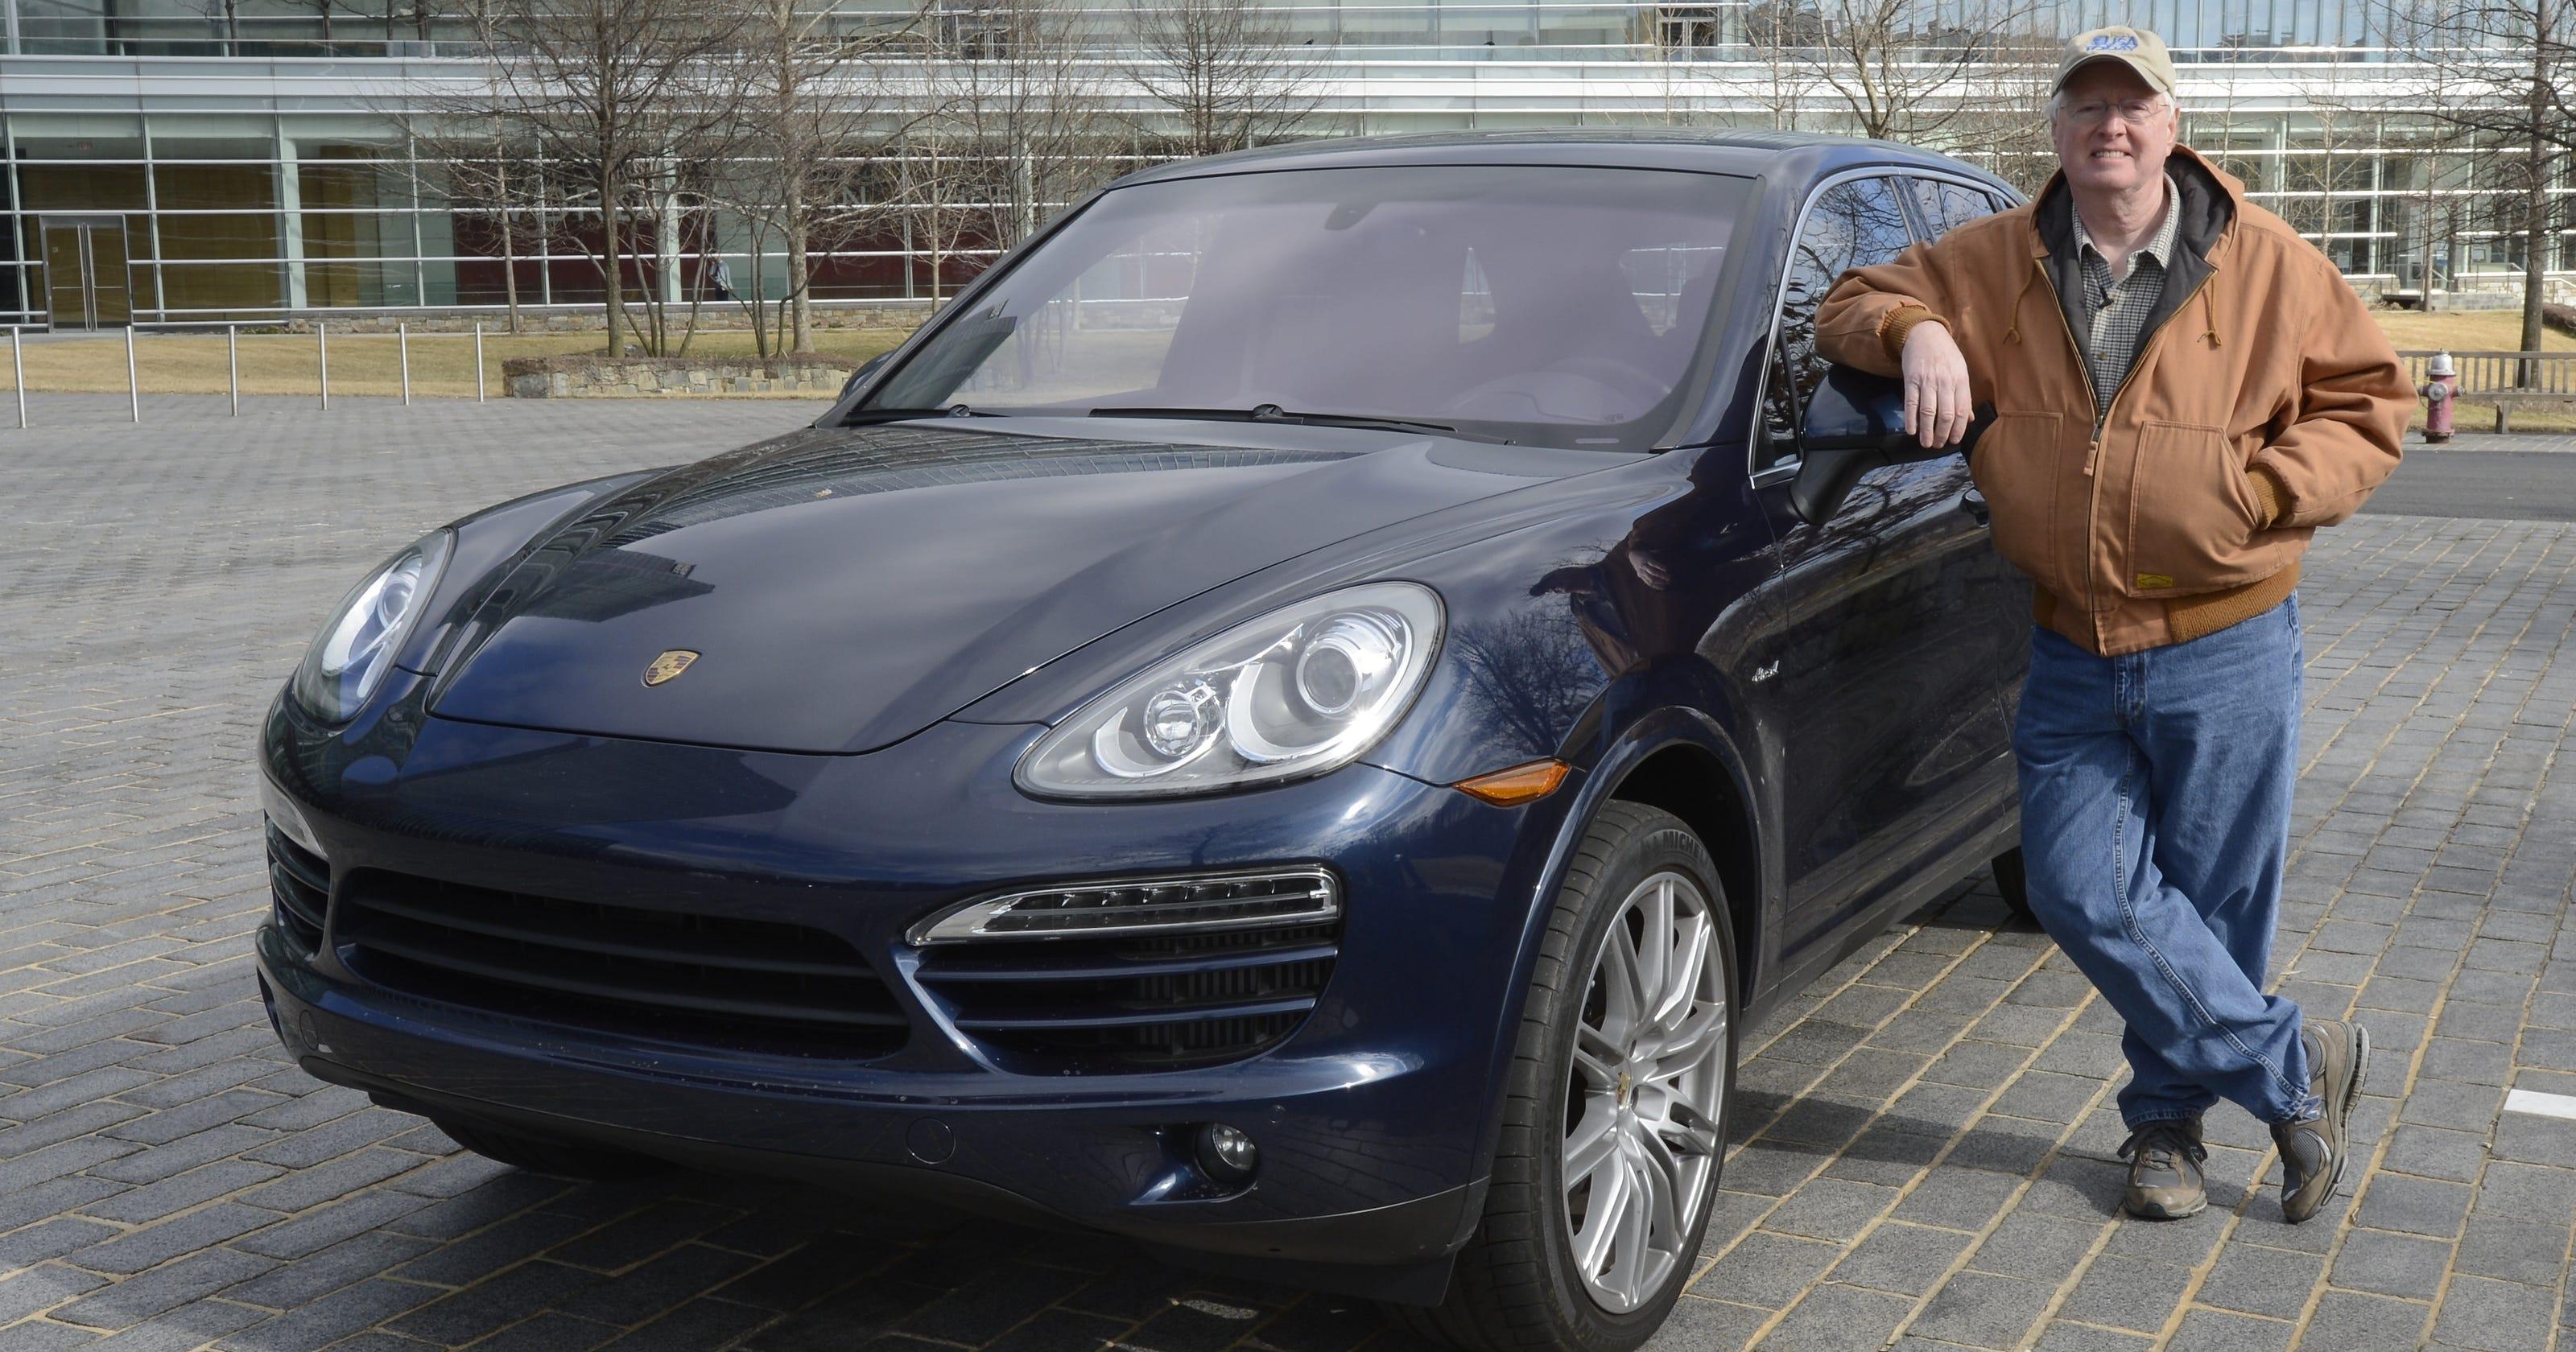 Test Drive: Porsche Cayenne diesel stands out